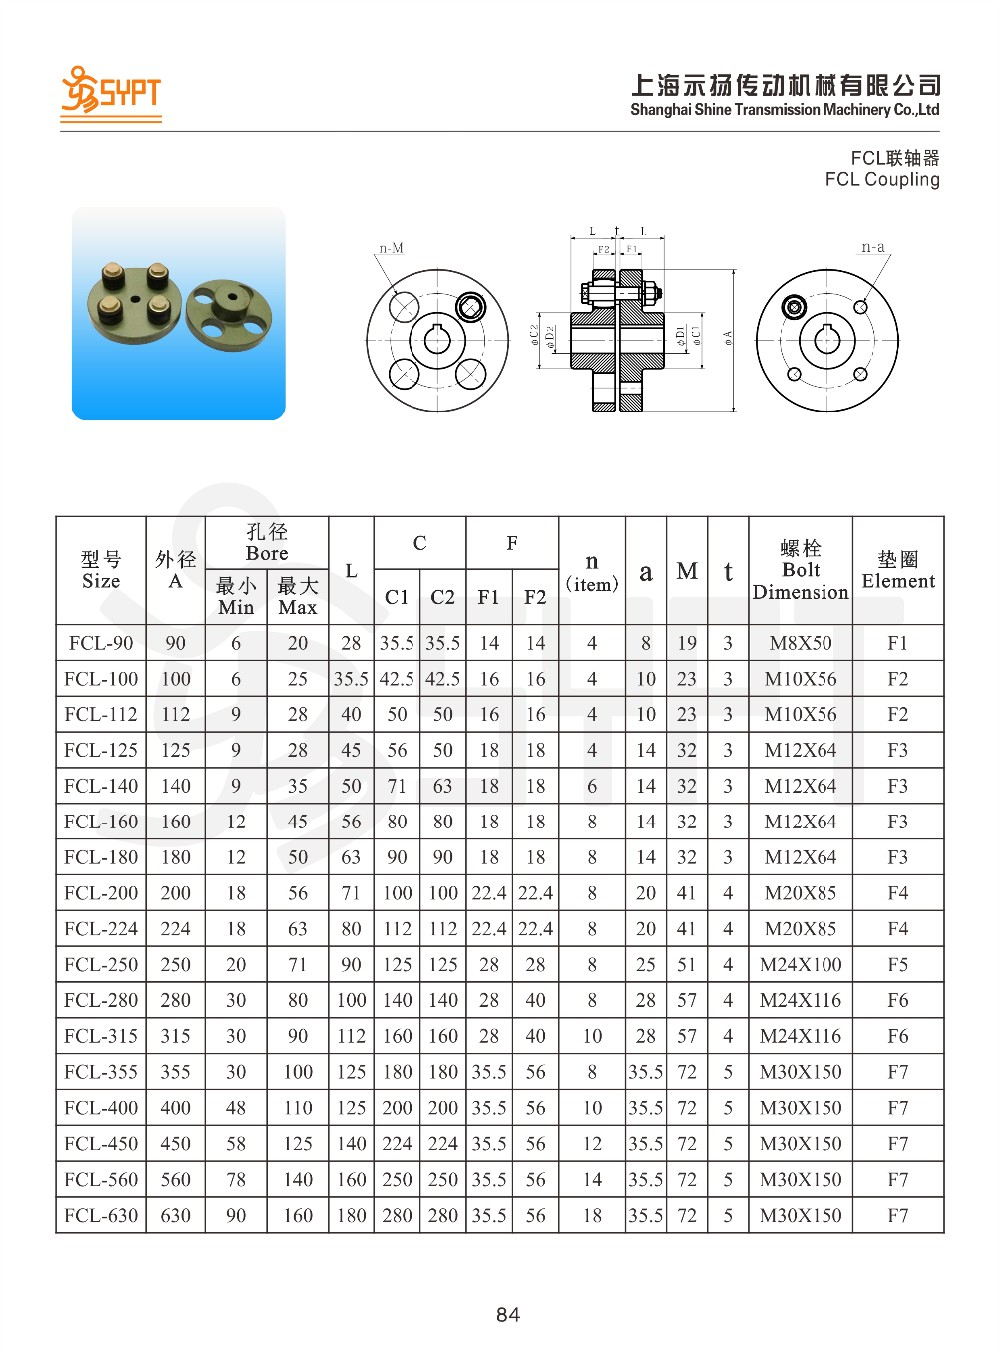 Flexible Fcl Pin Bush Couplings For Shaft Connection Buy Fcl Pin Couplings Pin Disc Coupling Pin Bush Coupling Product On Alibaba Com